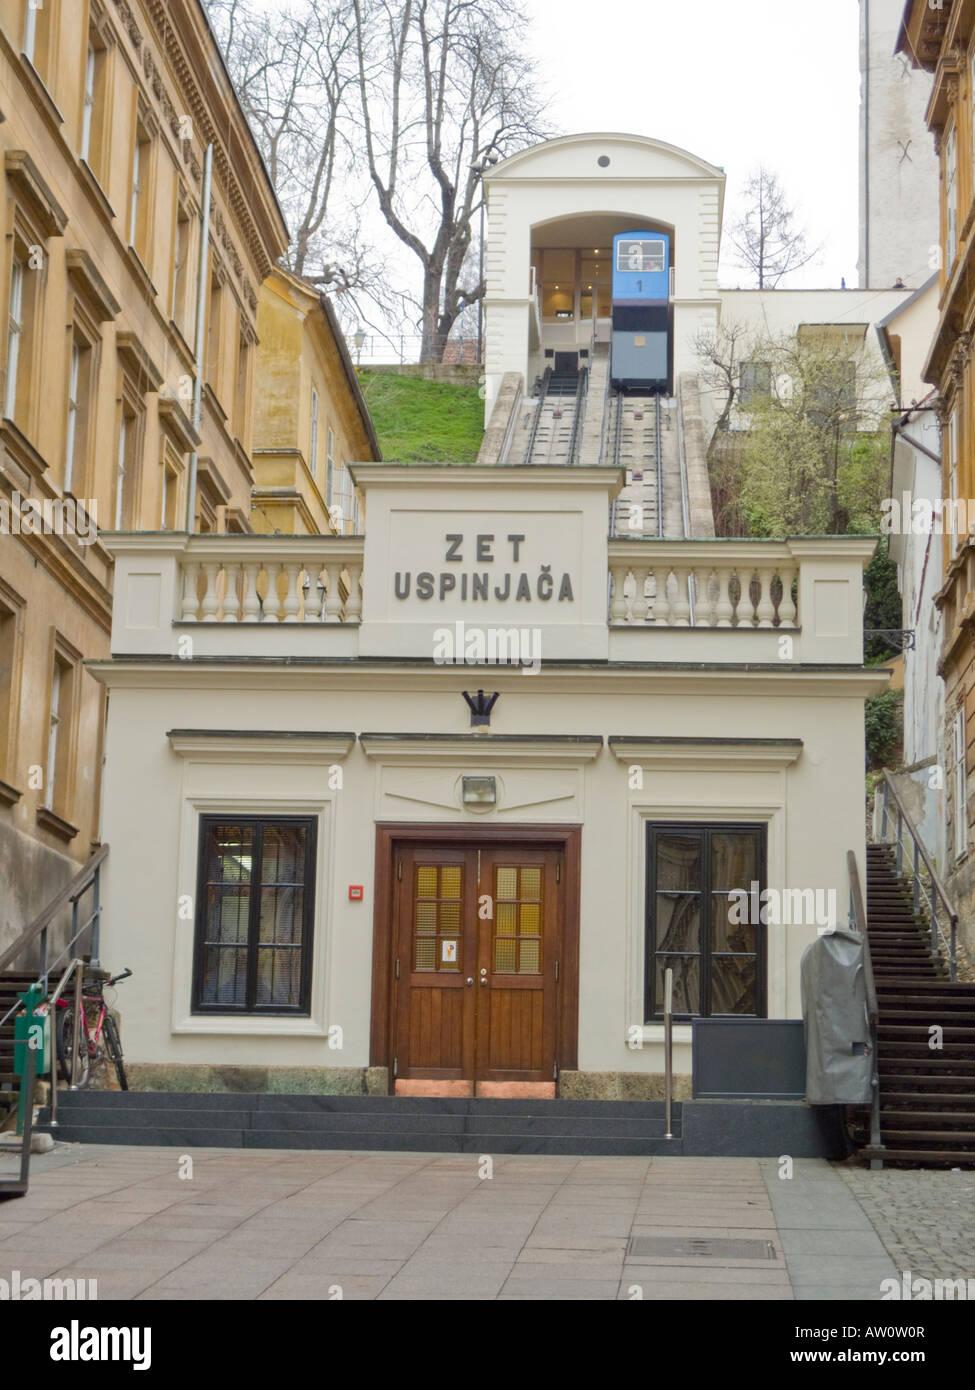 Zet Uspinjaca Zagreb Zet Zagreb Funicular Main Entrance